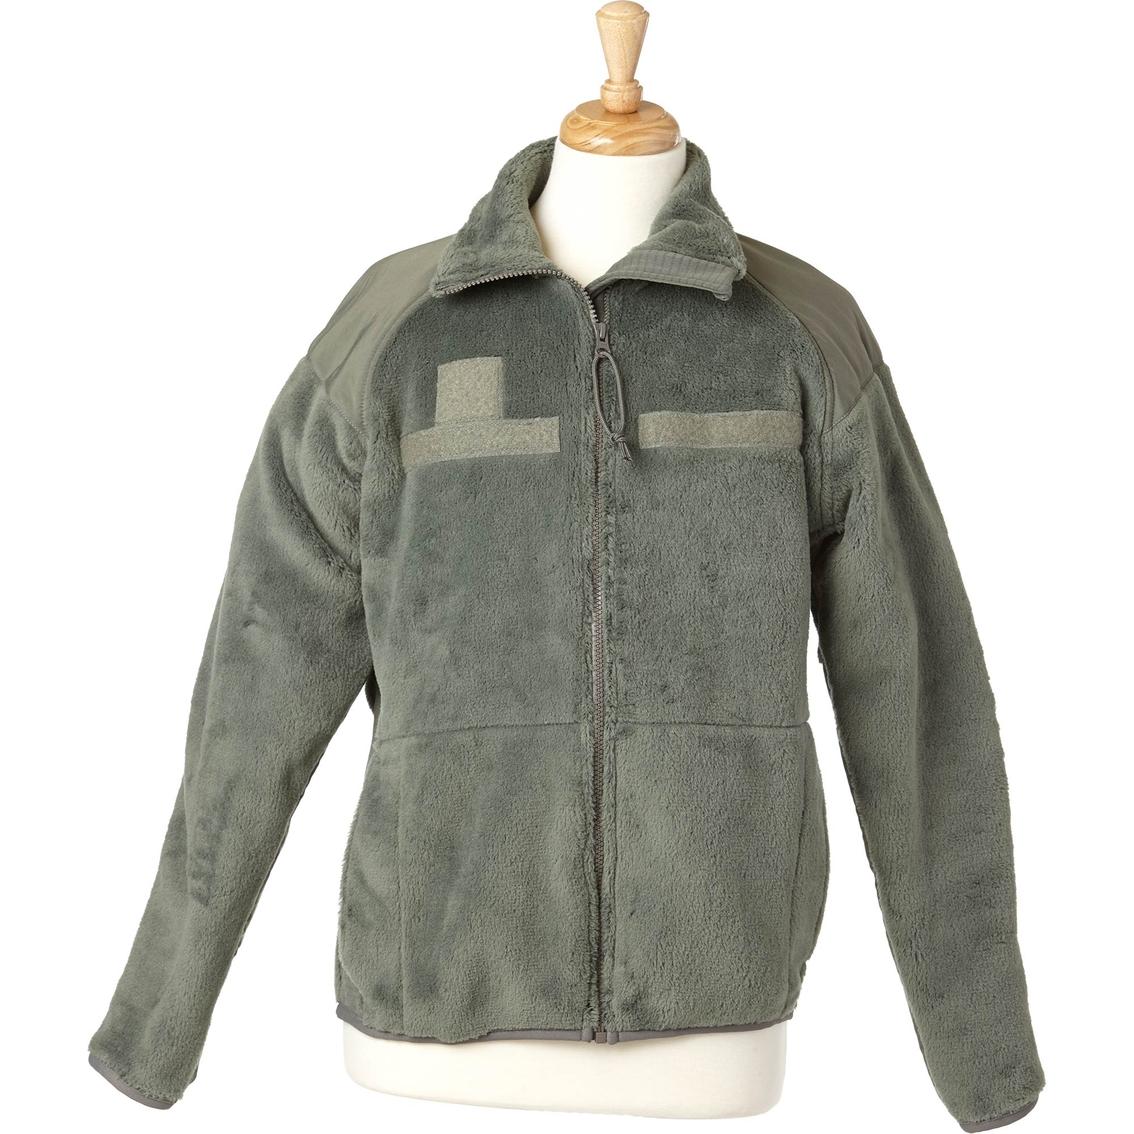 Dlats Foliage Green Fleece Jacket  a92fb56eb85